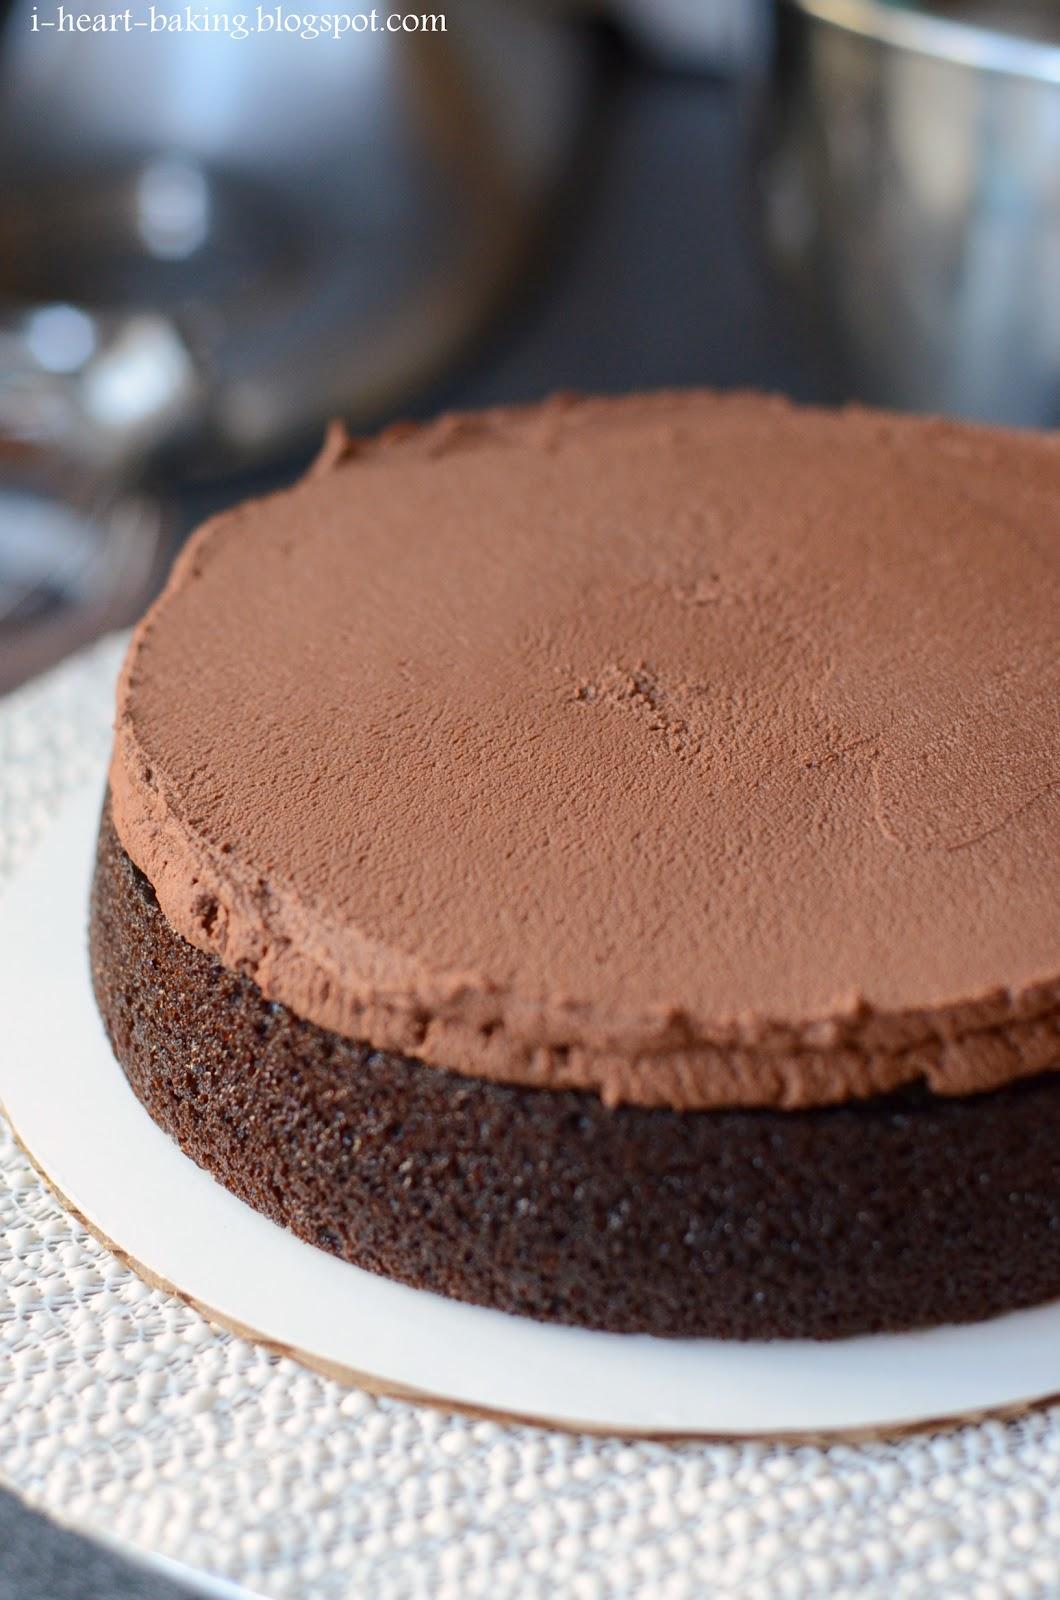 America test kitchen chocolate cake